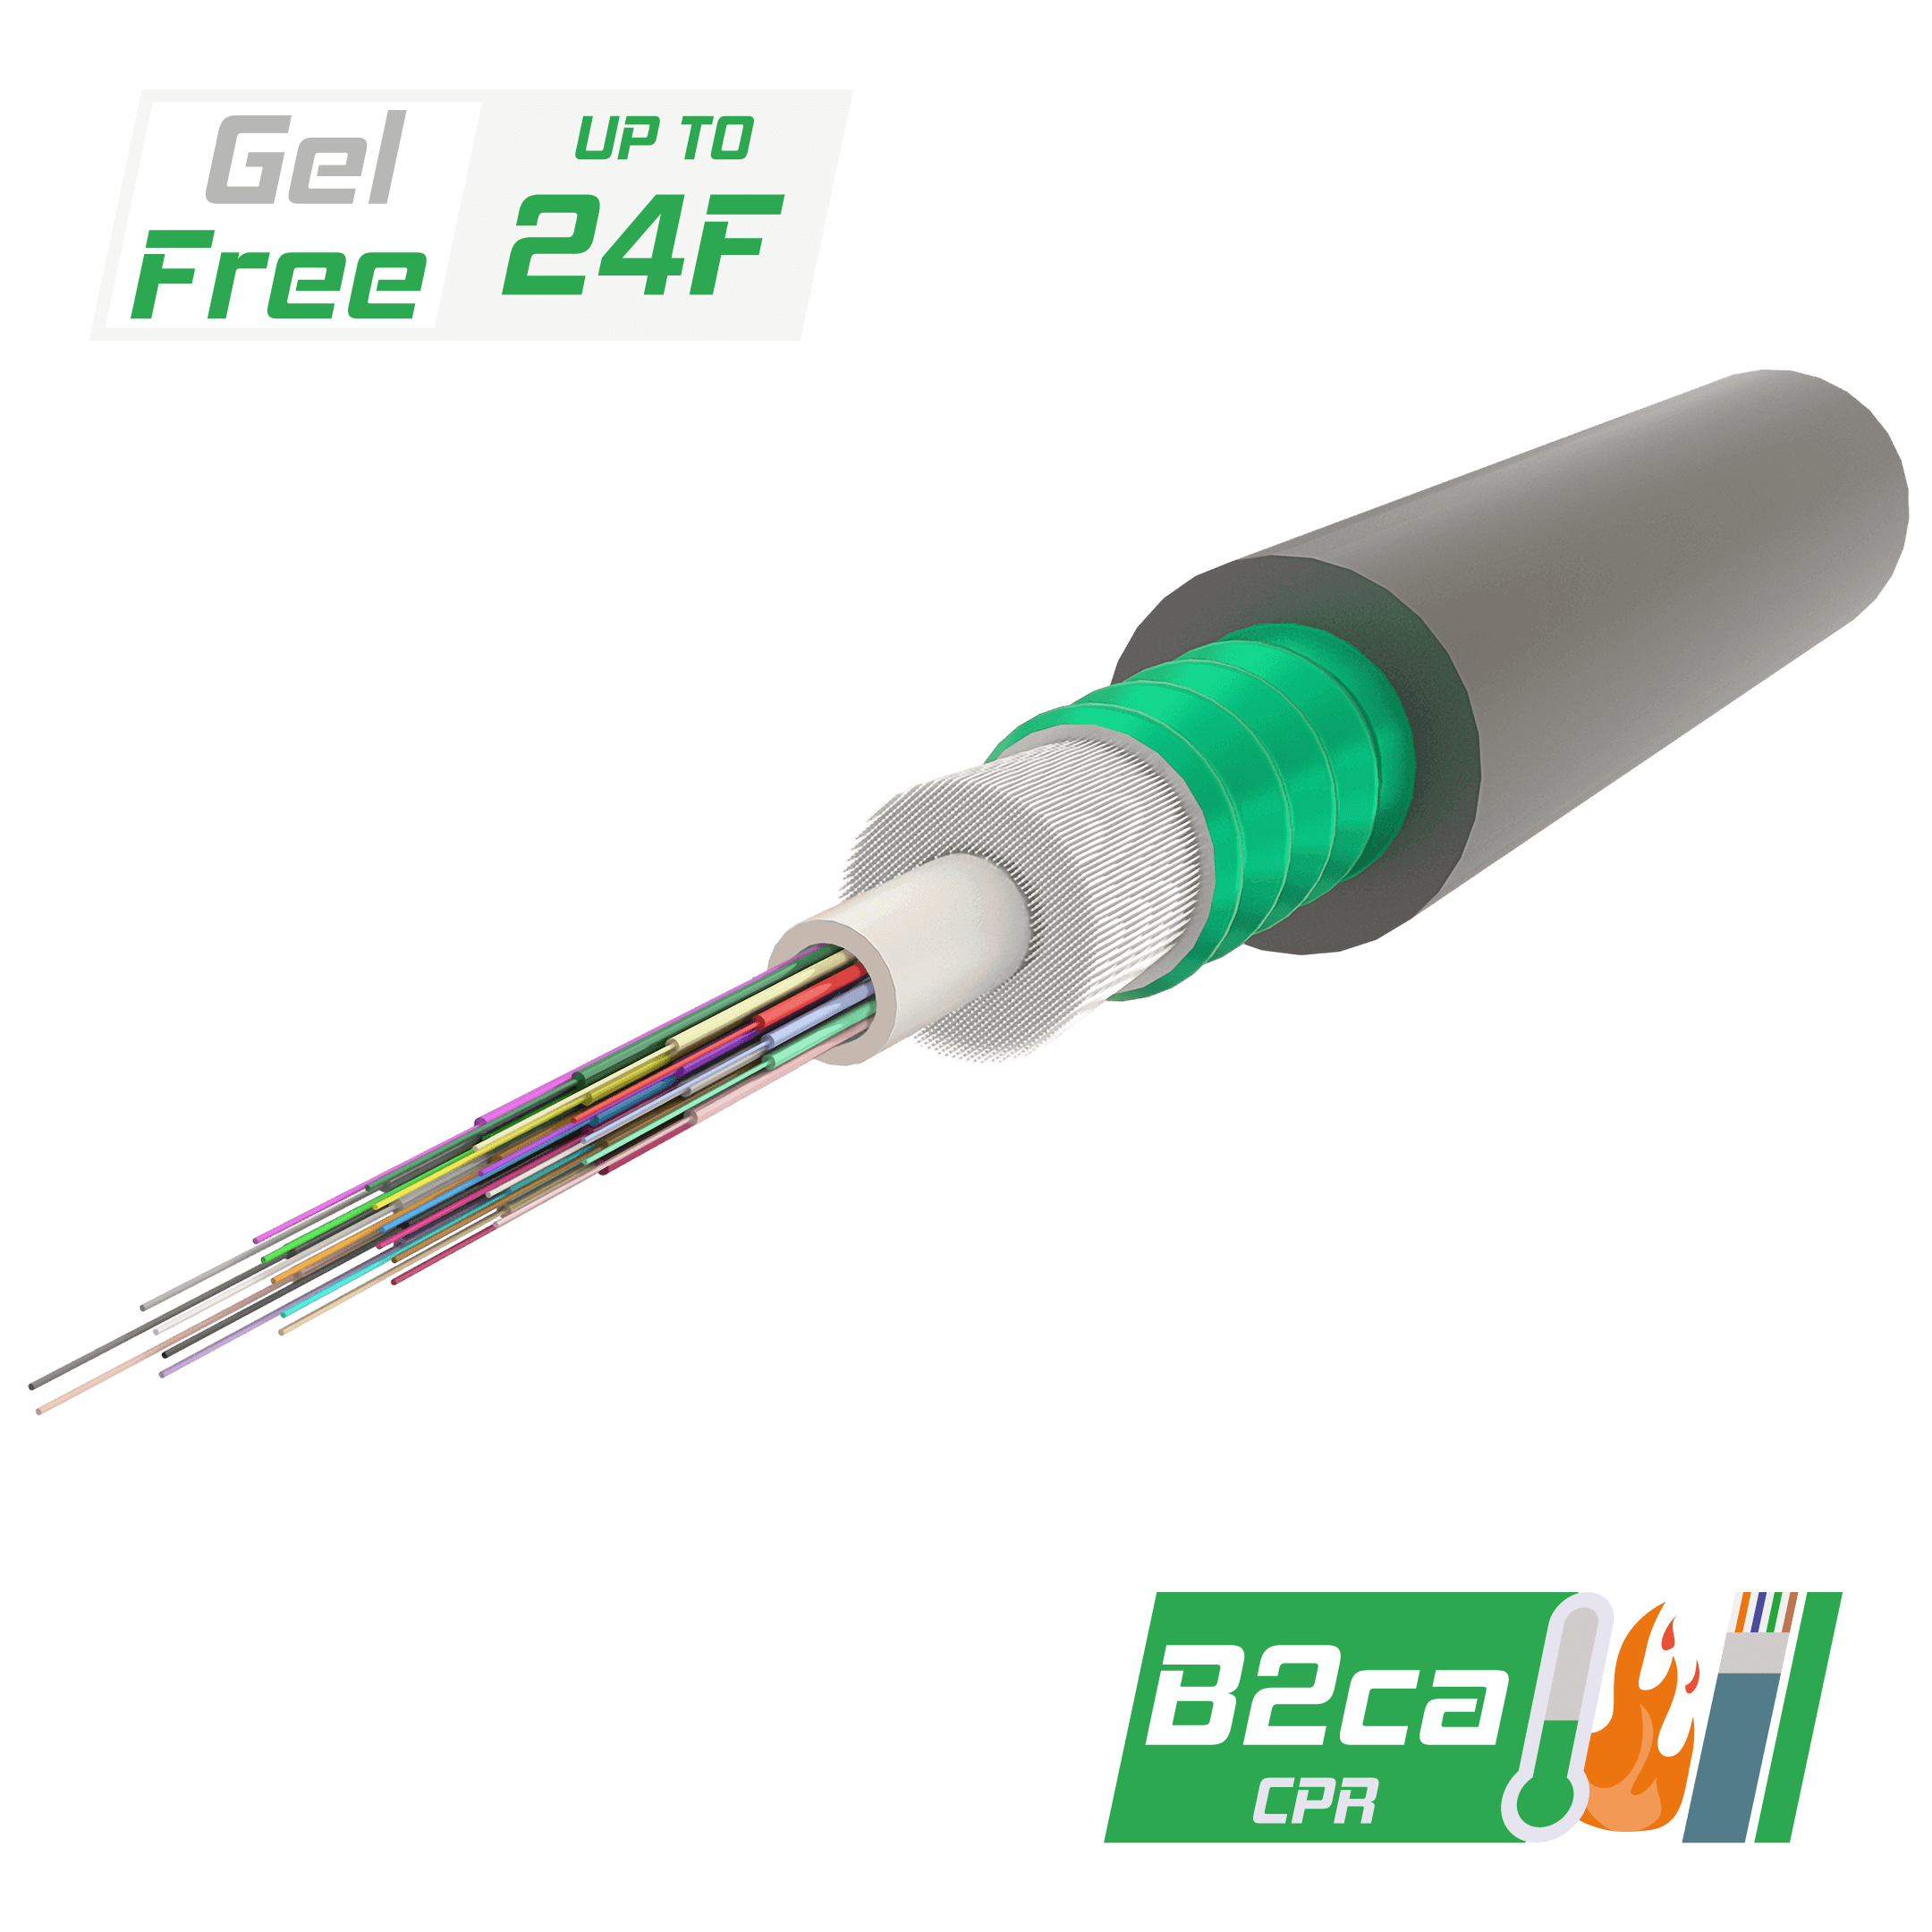 Samm Teknoloji - Çelik Zırhlı Merkezi Tüplü Fiber Optik Kablo | Gel-Free | A-DQ(ZN)(SR)H | CPR:B2ca | Up to 24F | 2000 metre